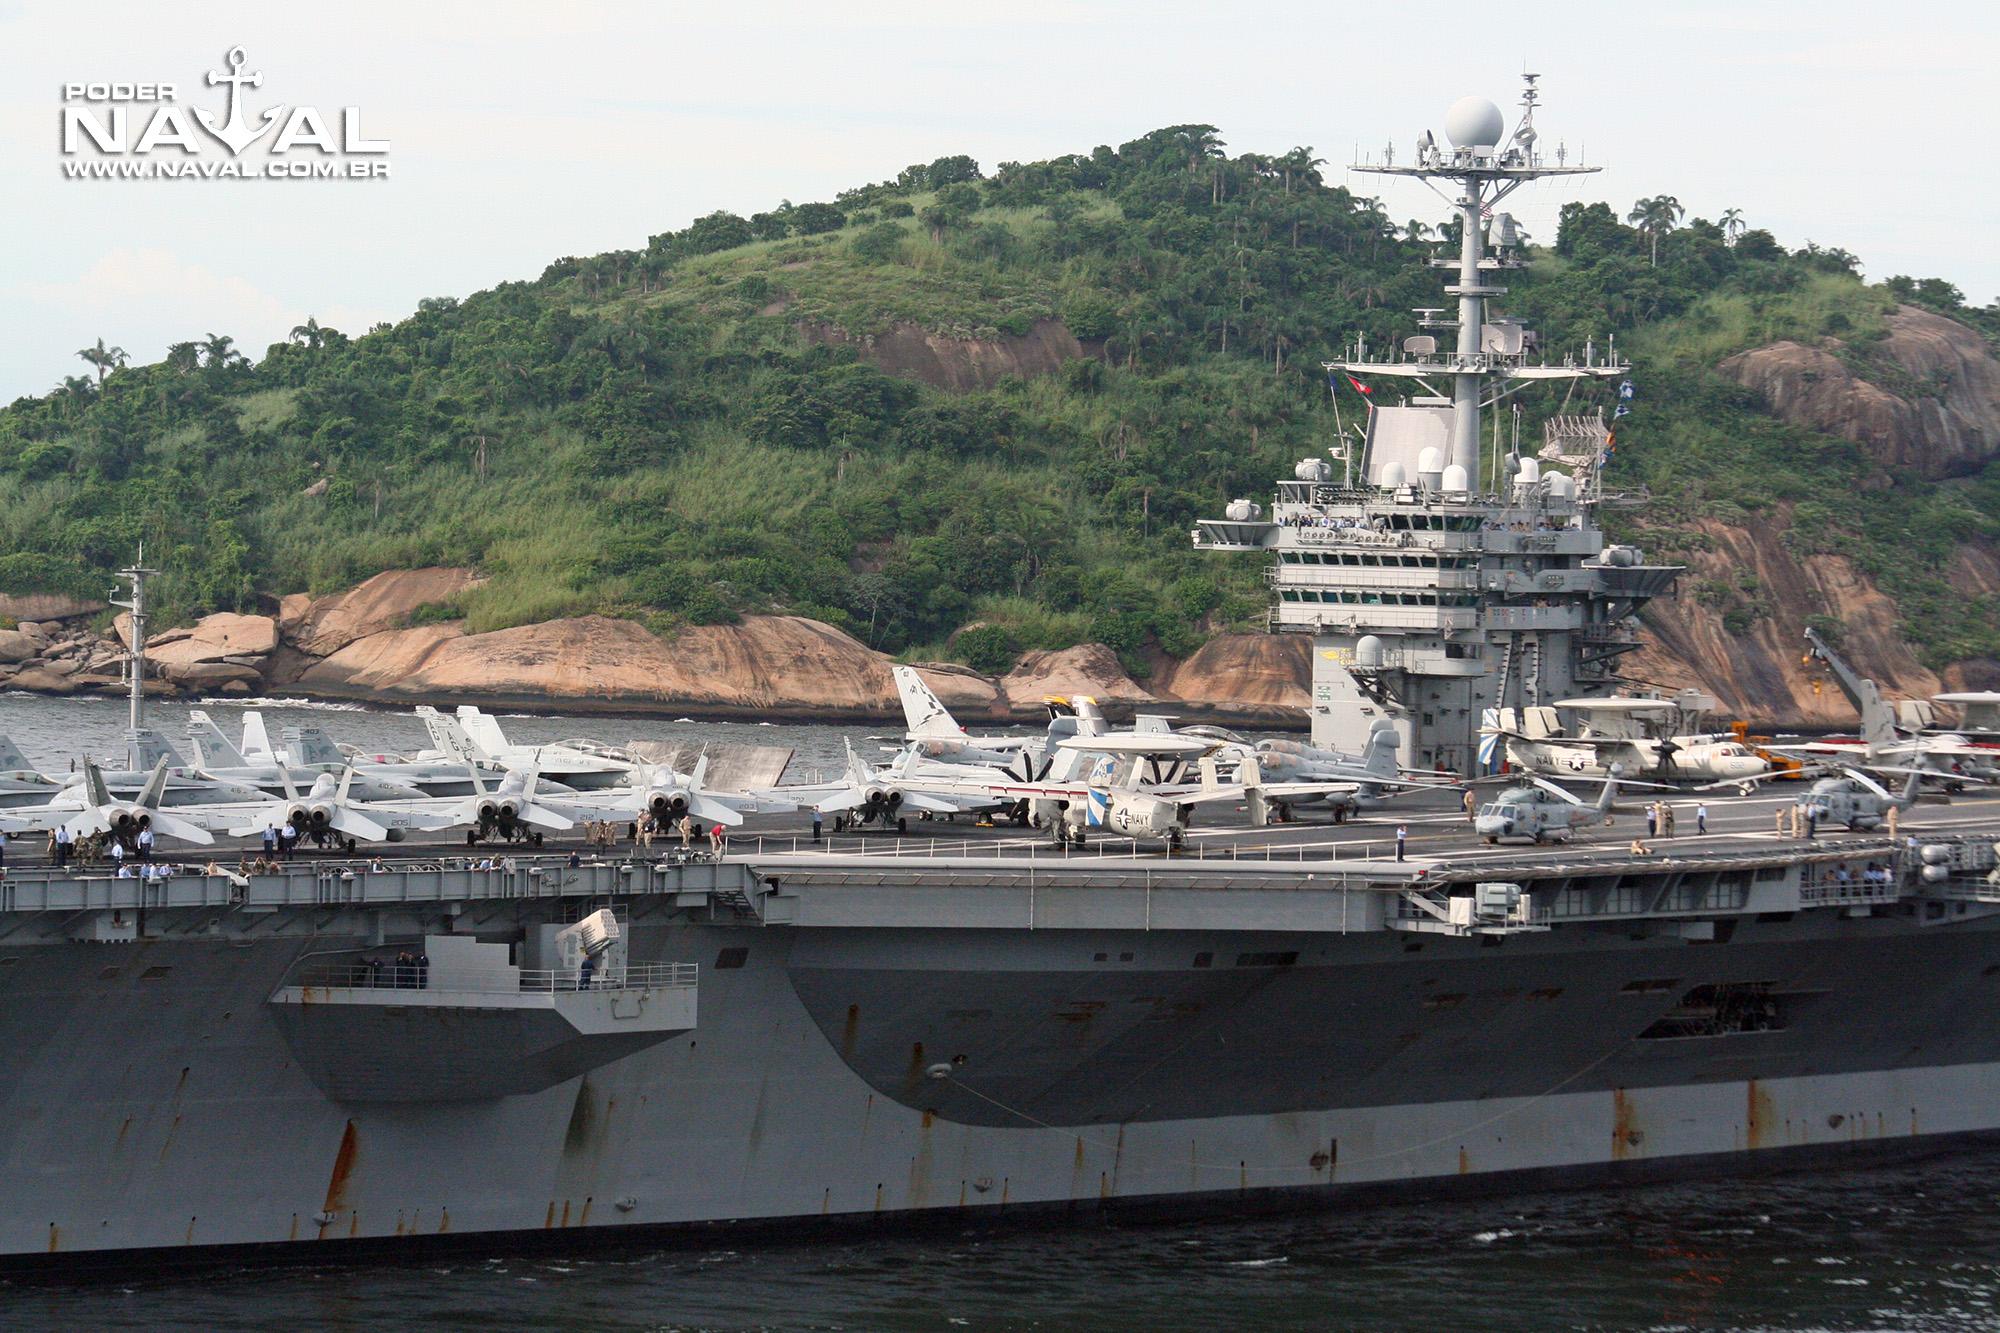 USS George Washington (CVN-73) no Rio - 2008 - 11